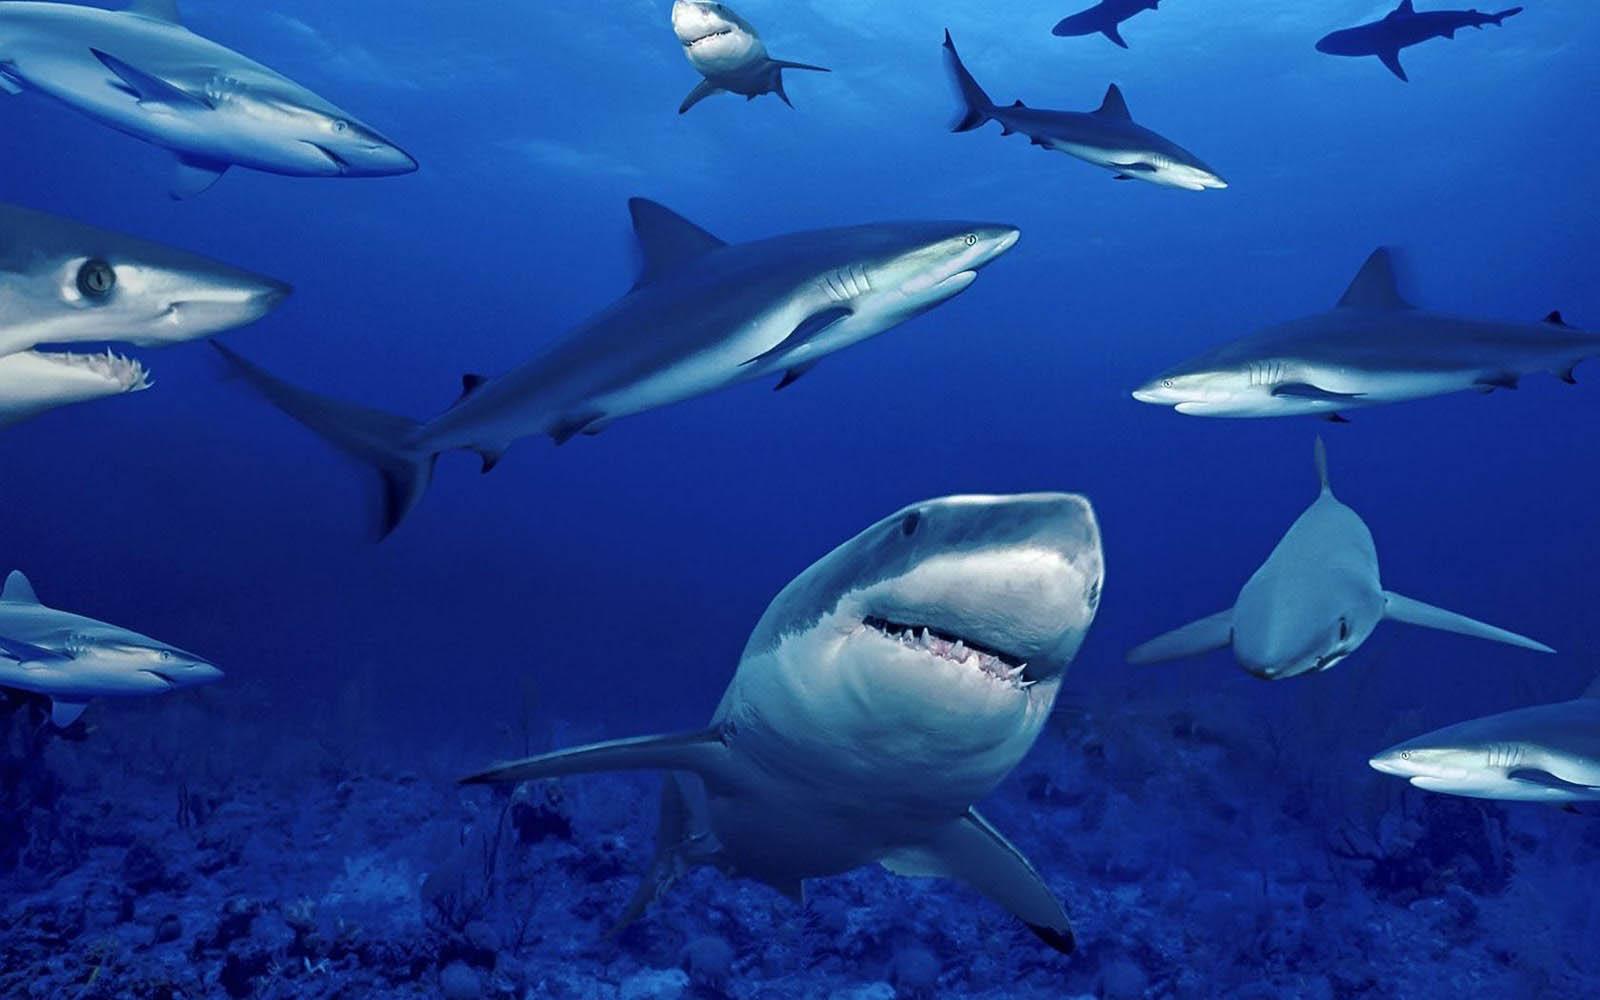 3d Wallpapers For Spring Wallpapers Sharks Desktop Wallpapers